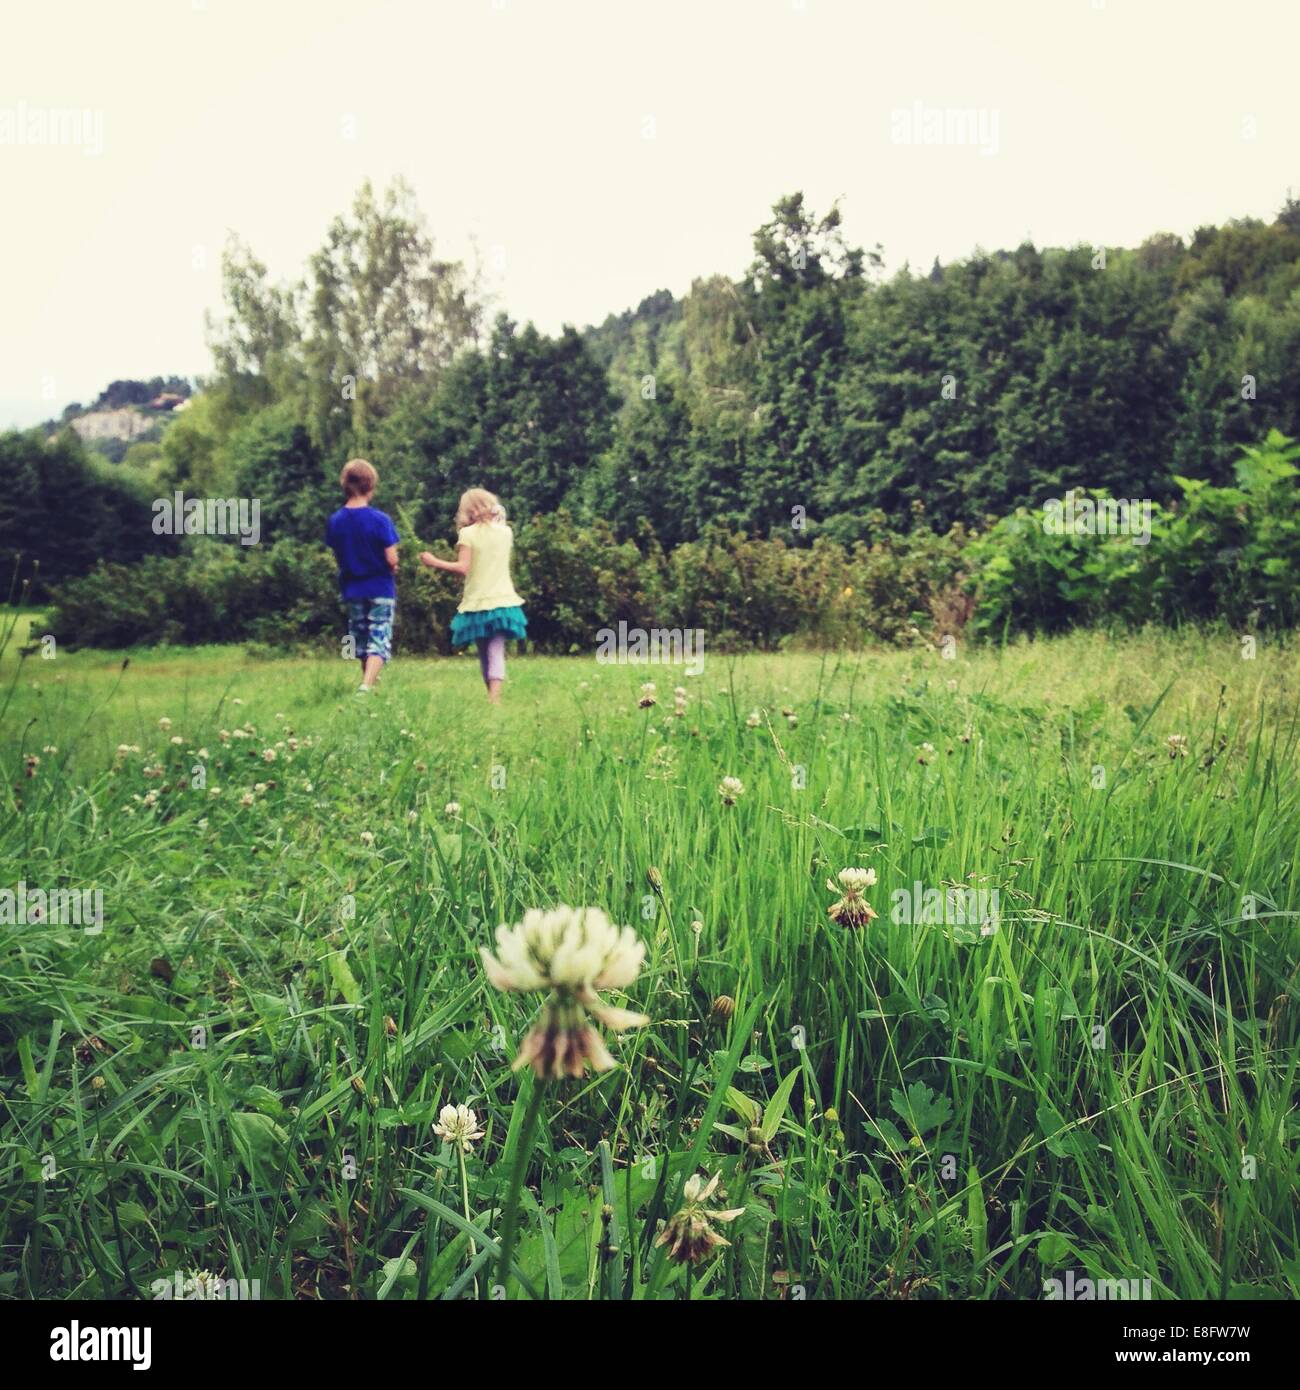 Boy and girl (10-11, 12-13) walking on meadow - Stock Image